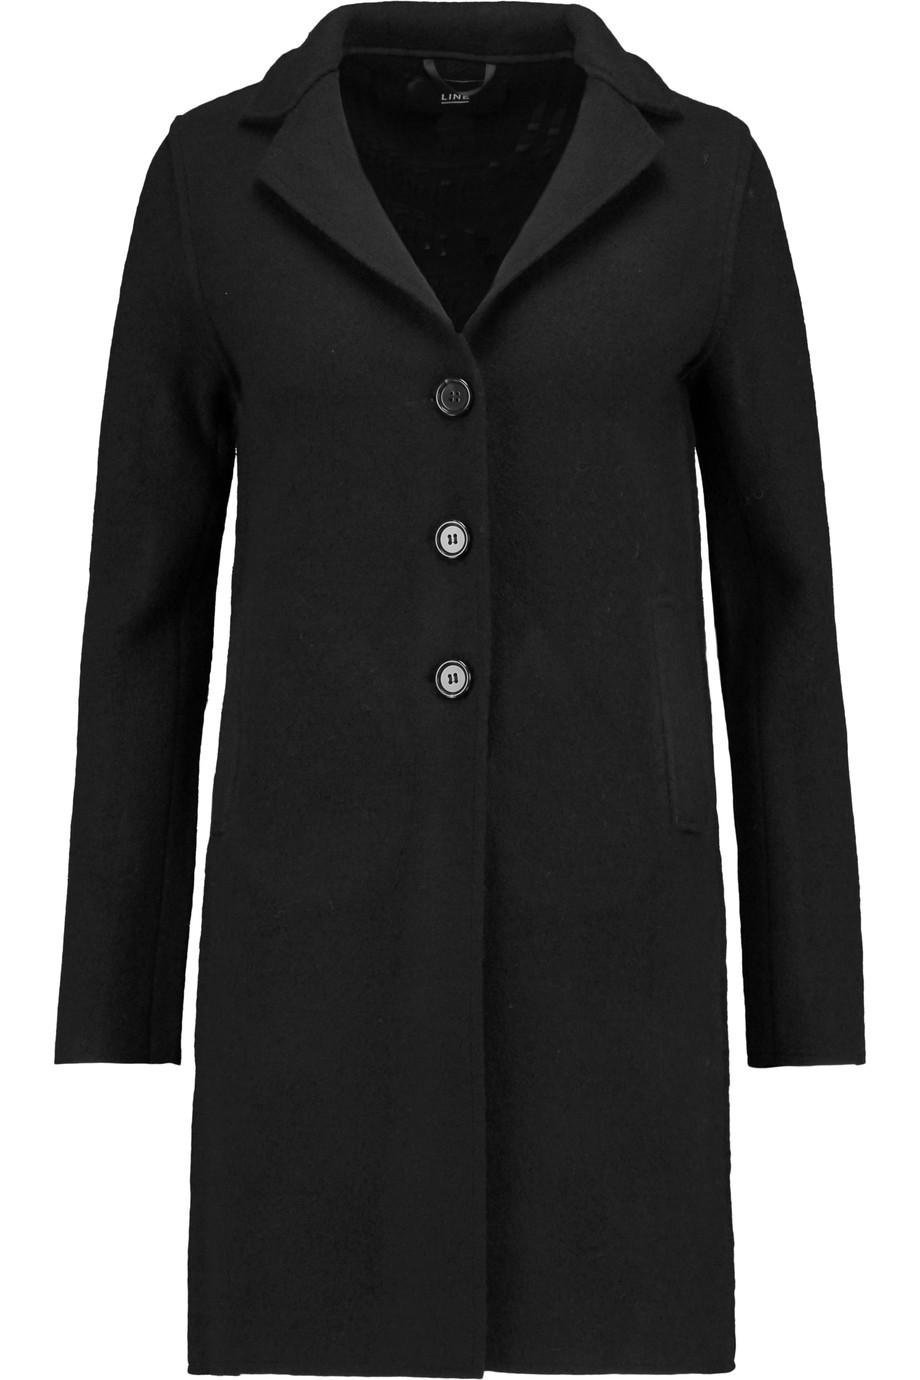 Tessa Wool-Blend Coat ...